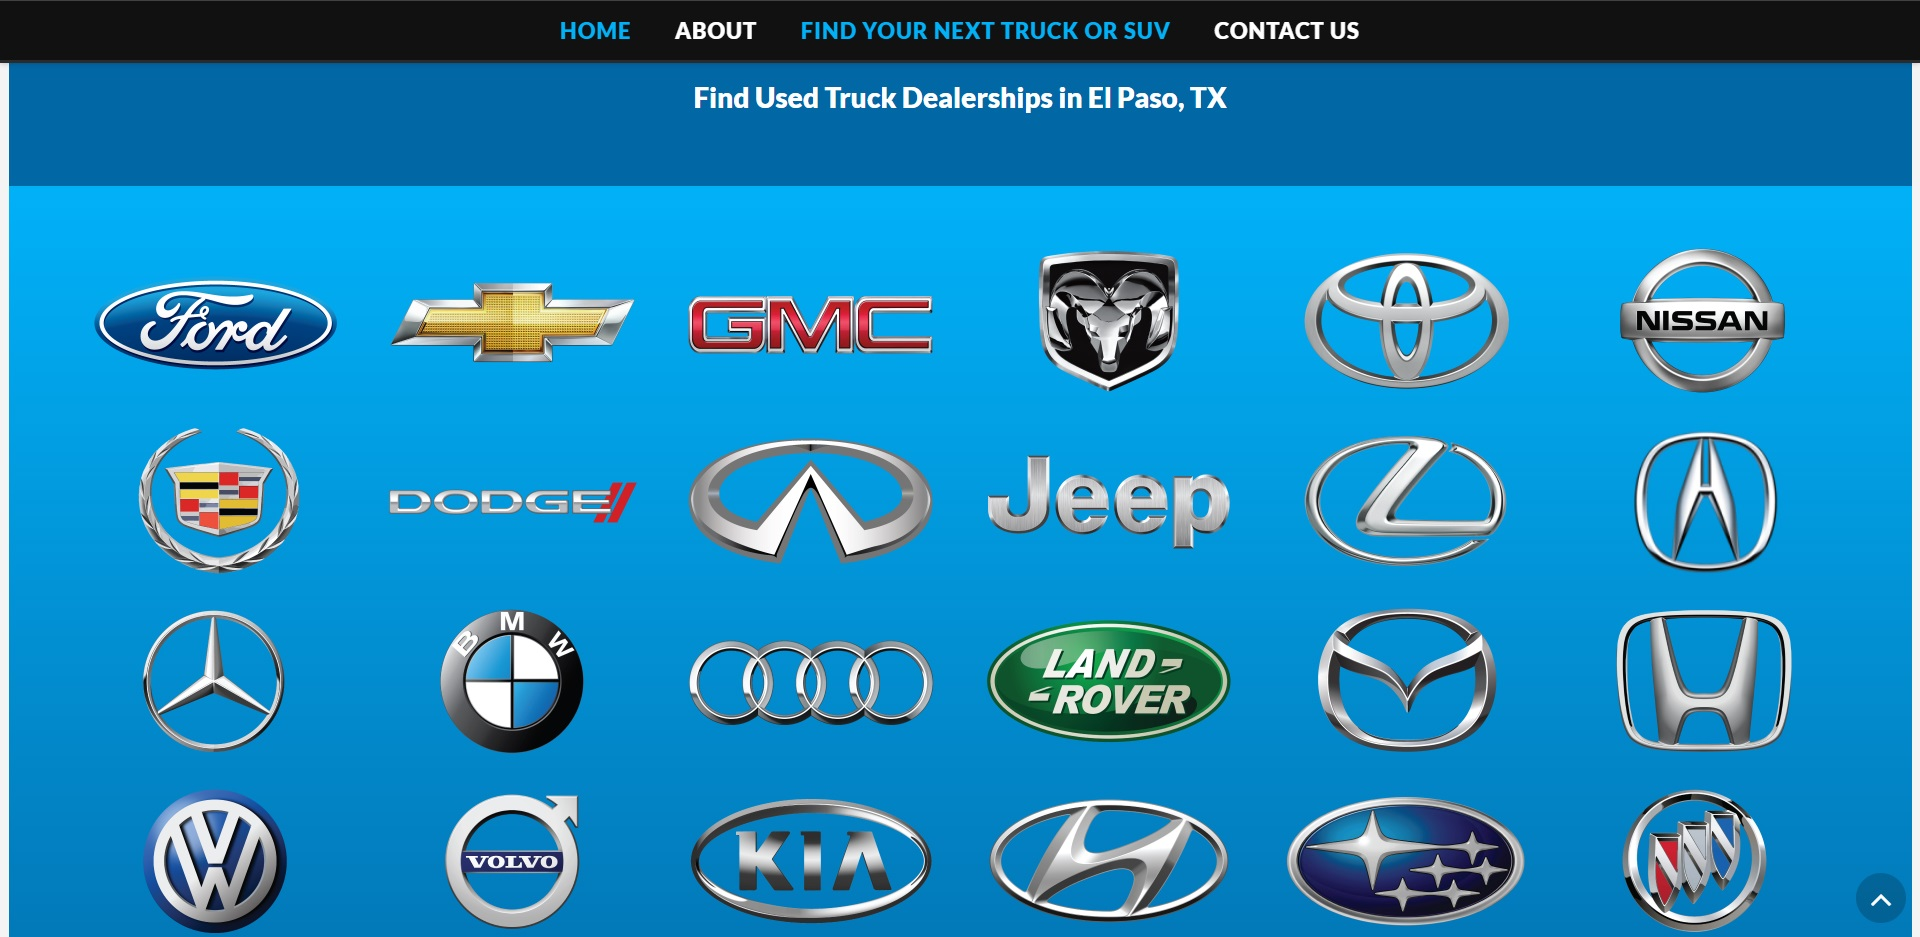 El Paso, TX Best BMW Dealers